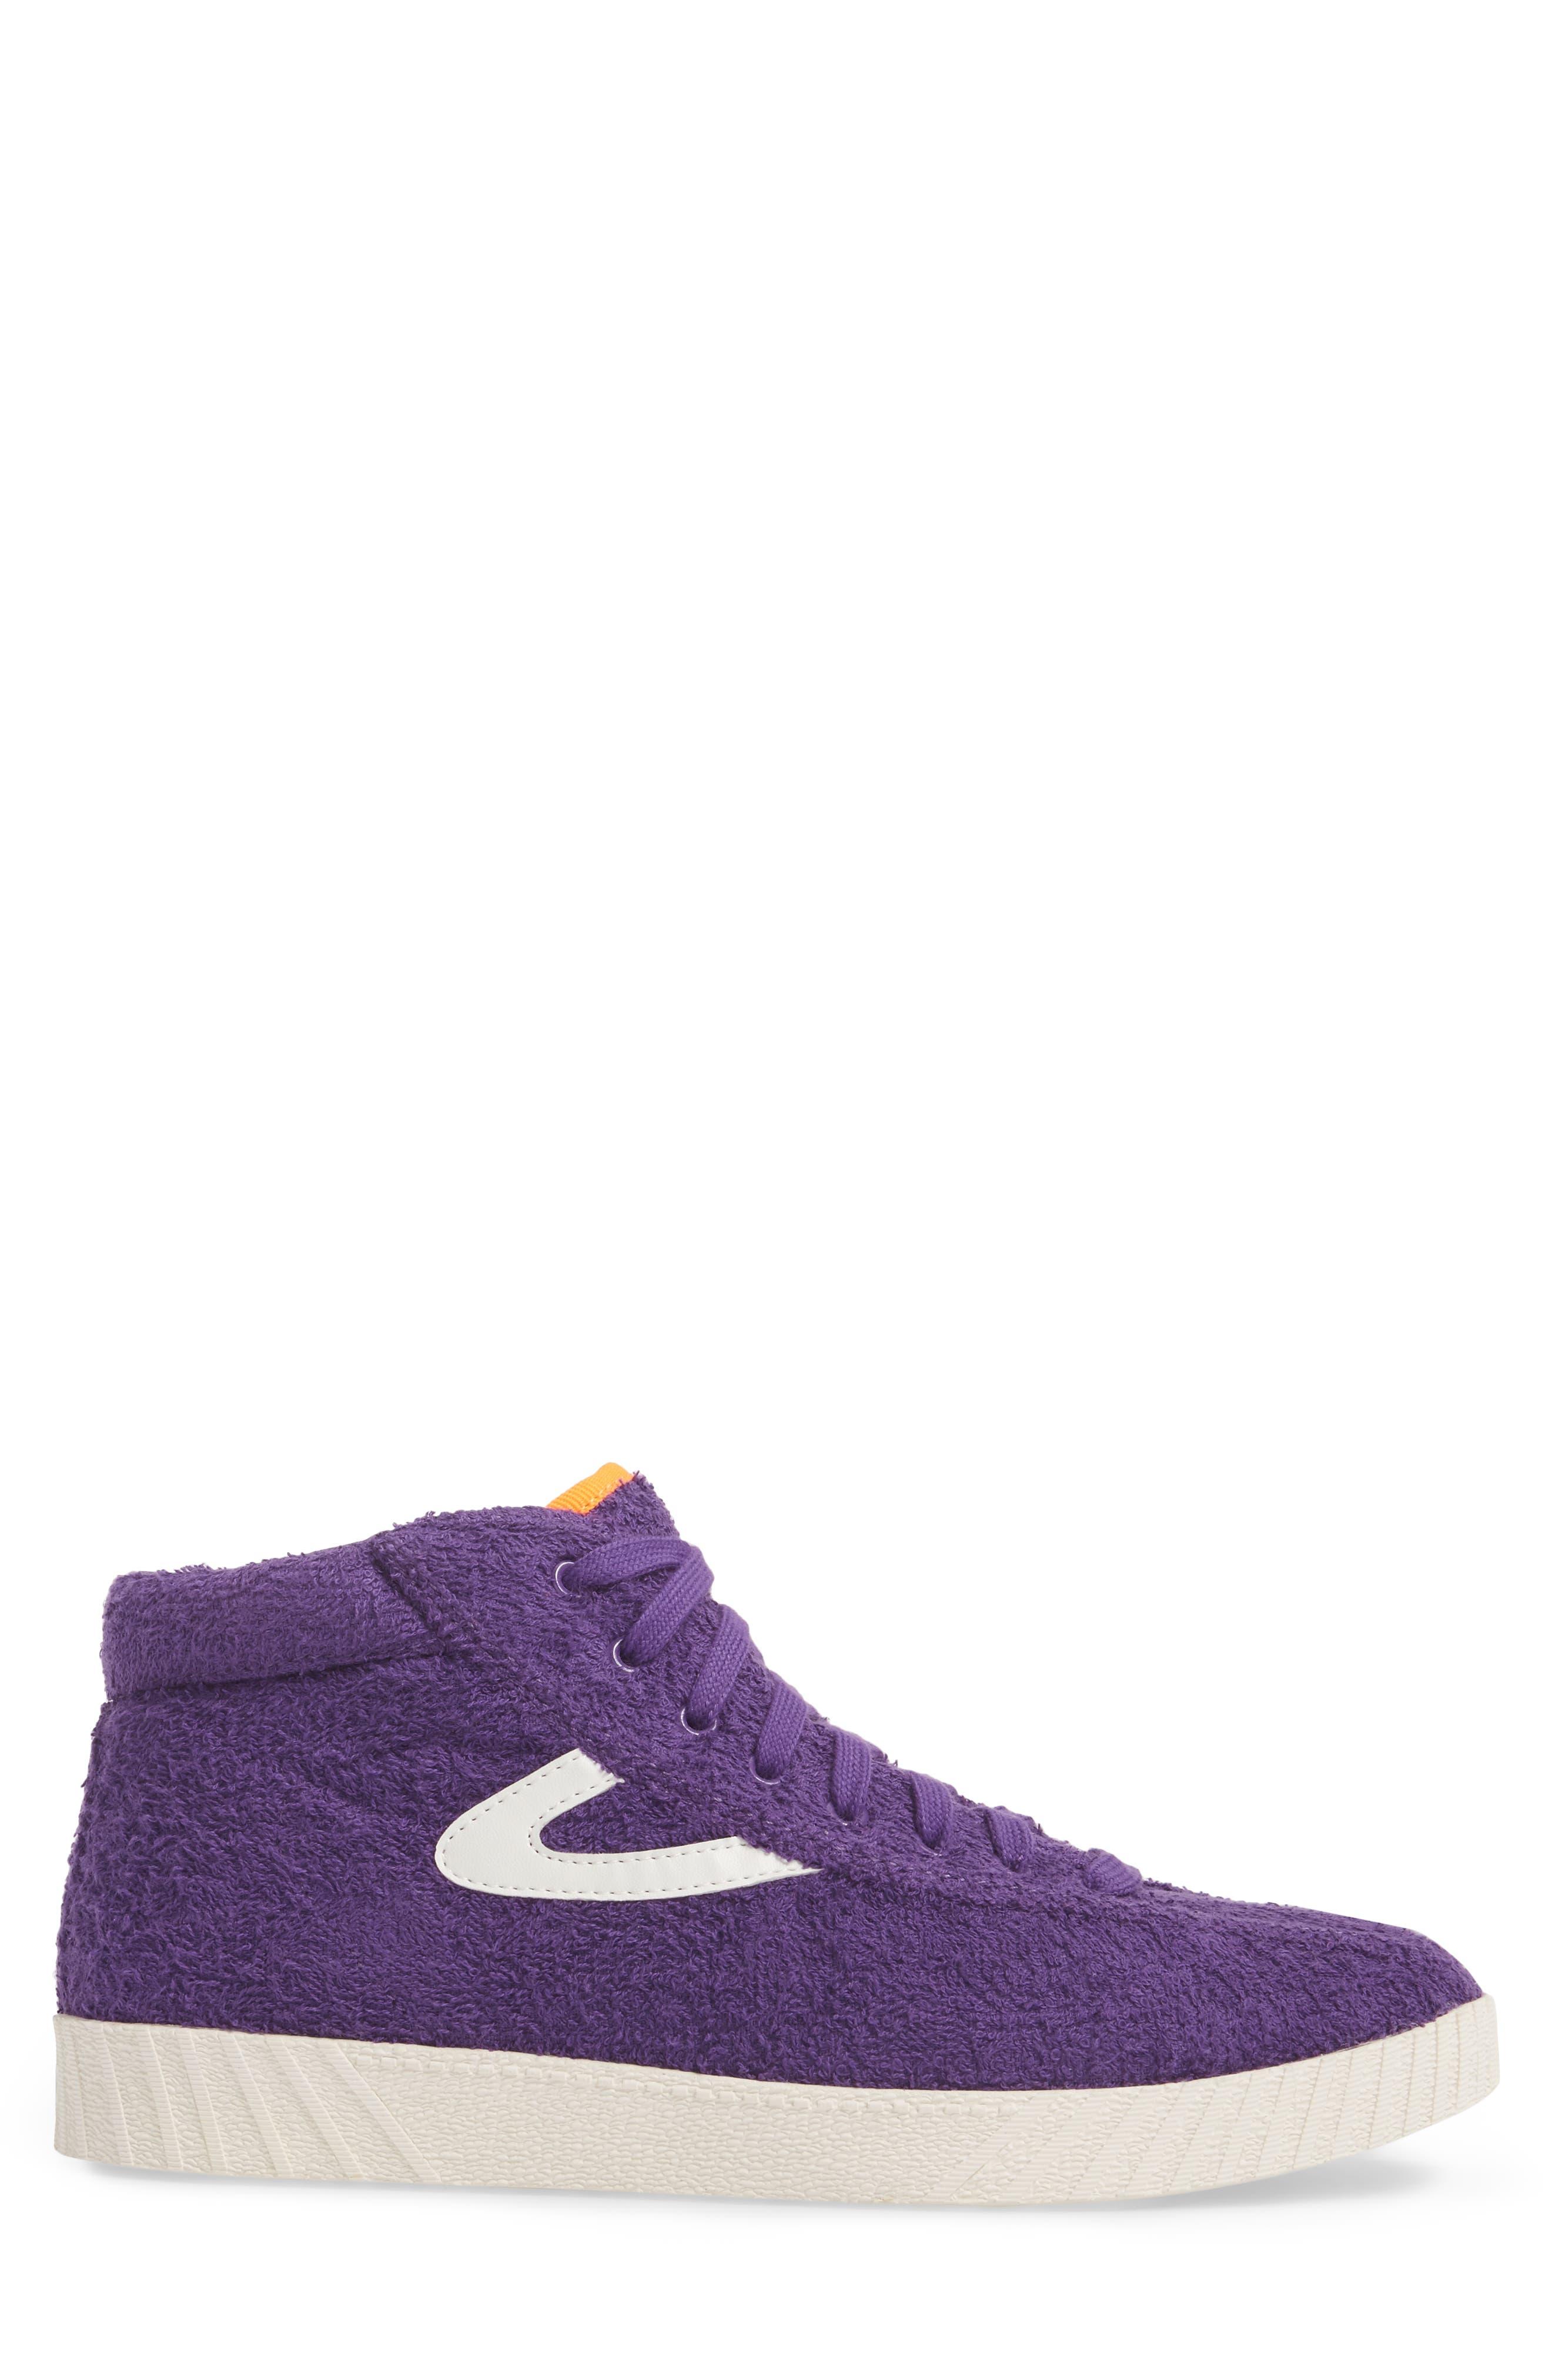 Andre 3000 Nylite High Top Sneaker,                             Alternate thumbnail 3, color,                             Vibrant Purple/ Vintage White